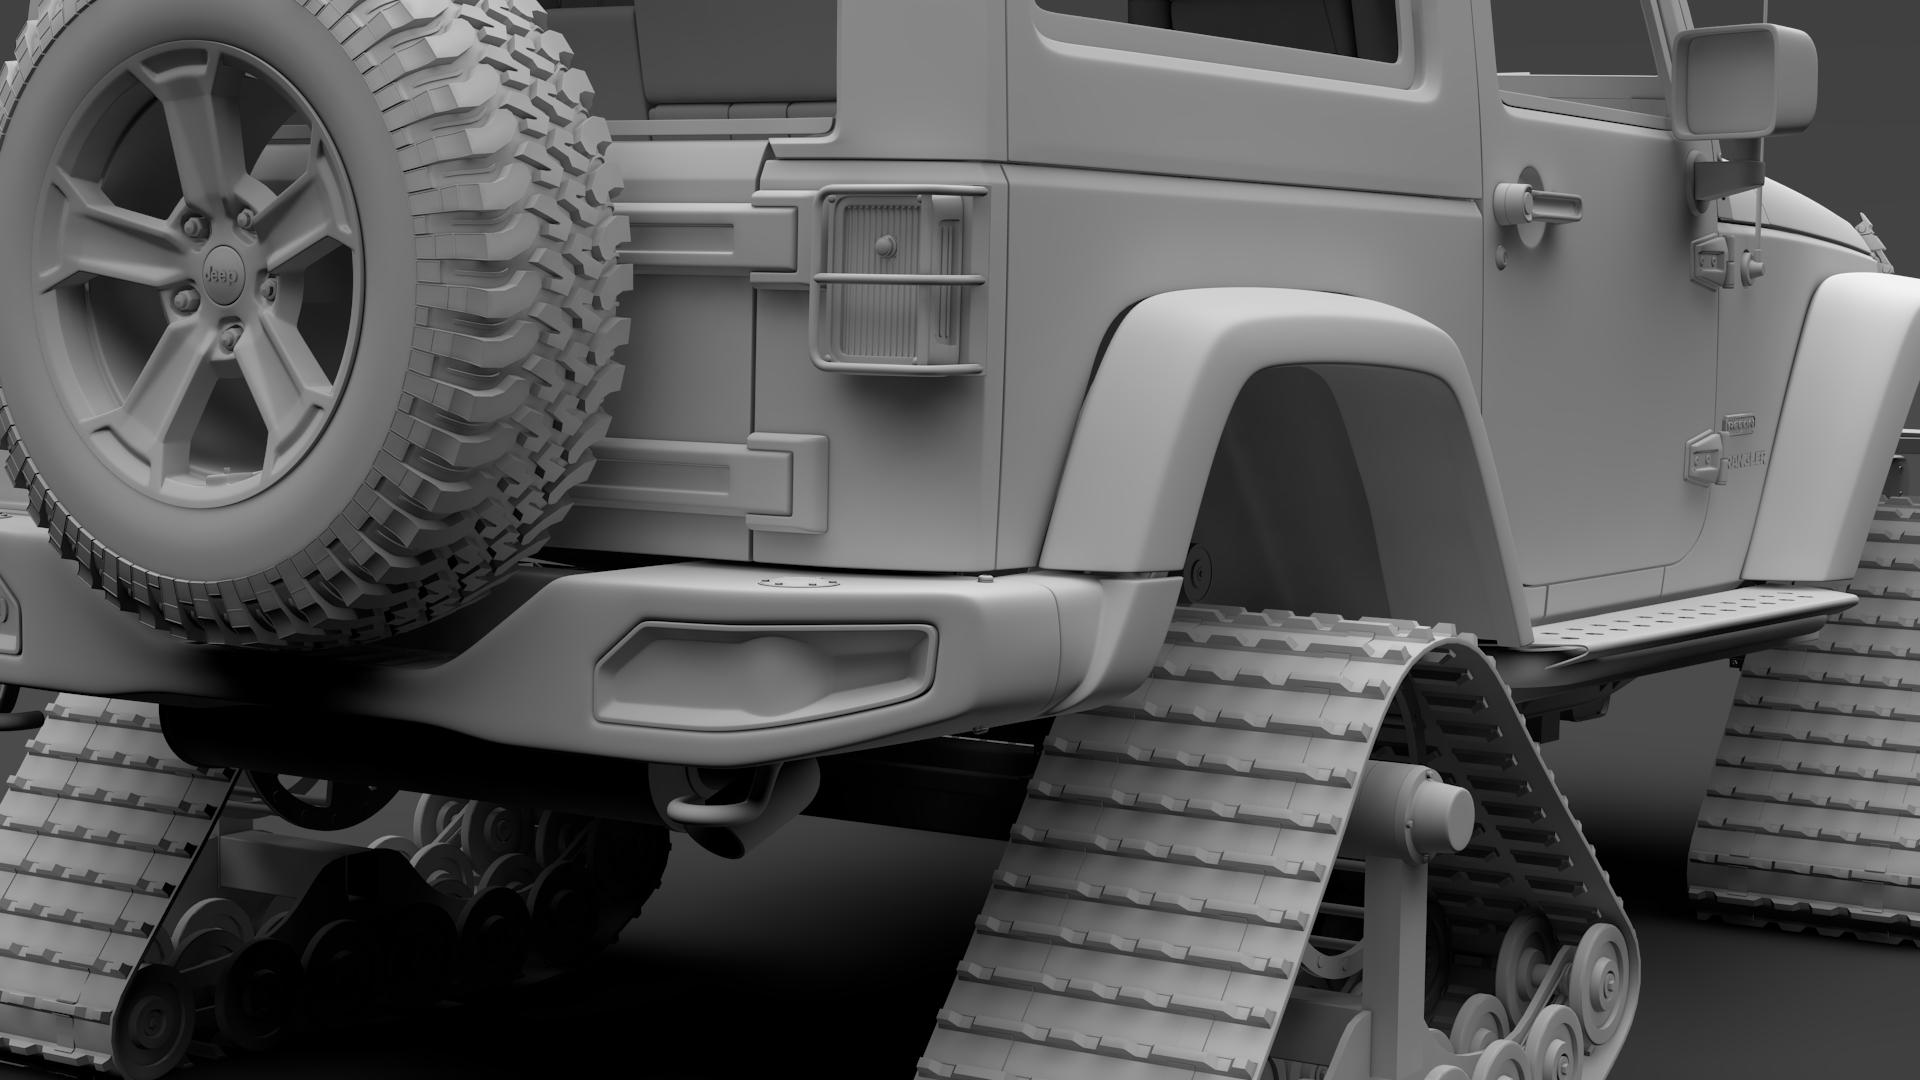 jeep wrangler crawler rubicon recon jk 2017 3d model max fbx c4d lwo ma mb hrc xsi obj 276929